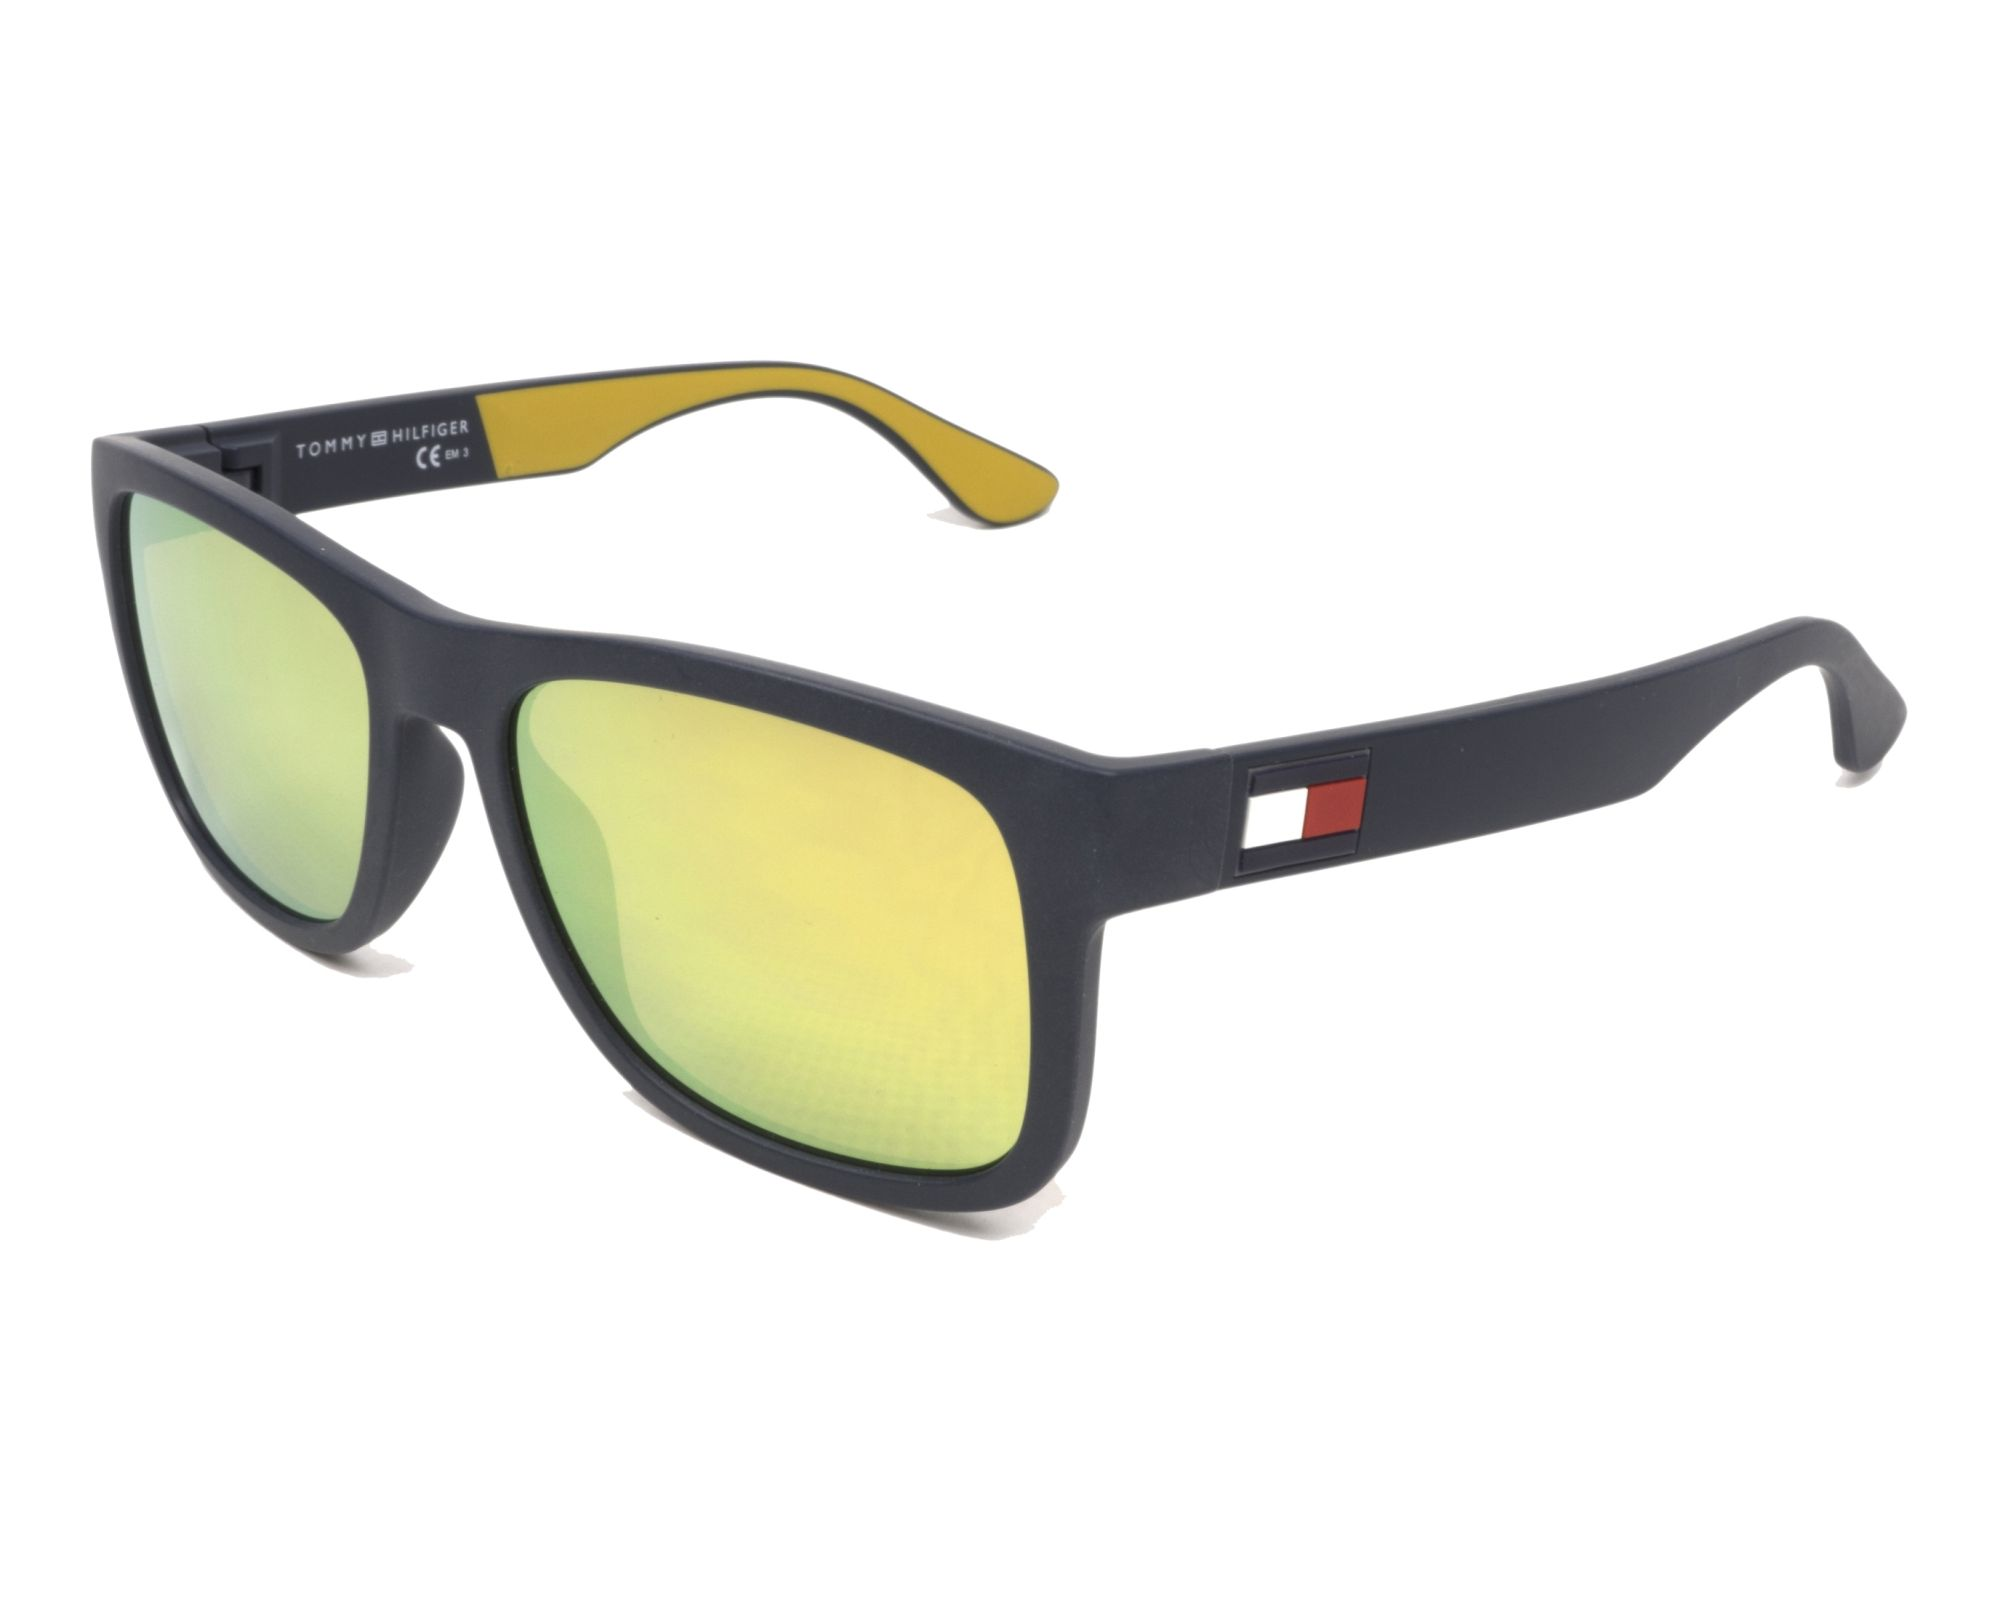 087e66e891 Gafas de sol Tommy Hilfiger TH-1556-S DCD/K1 56-18